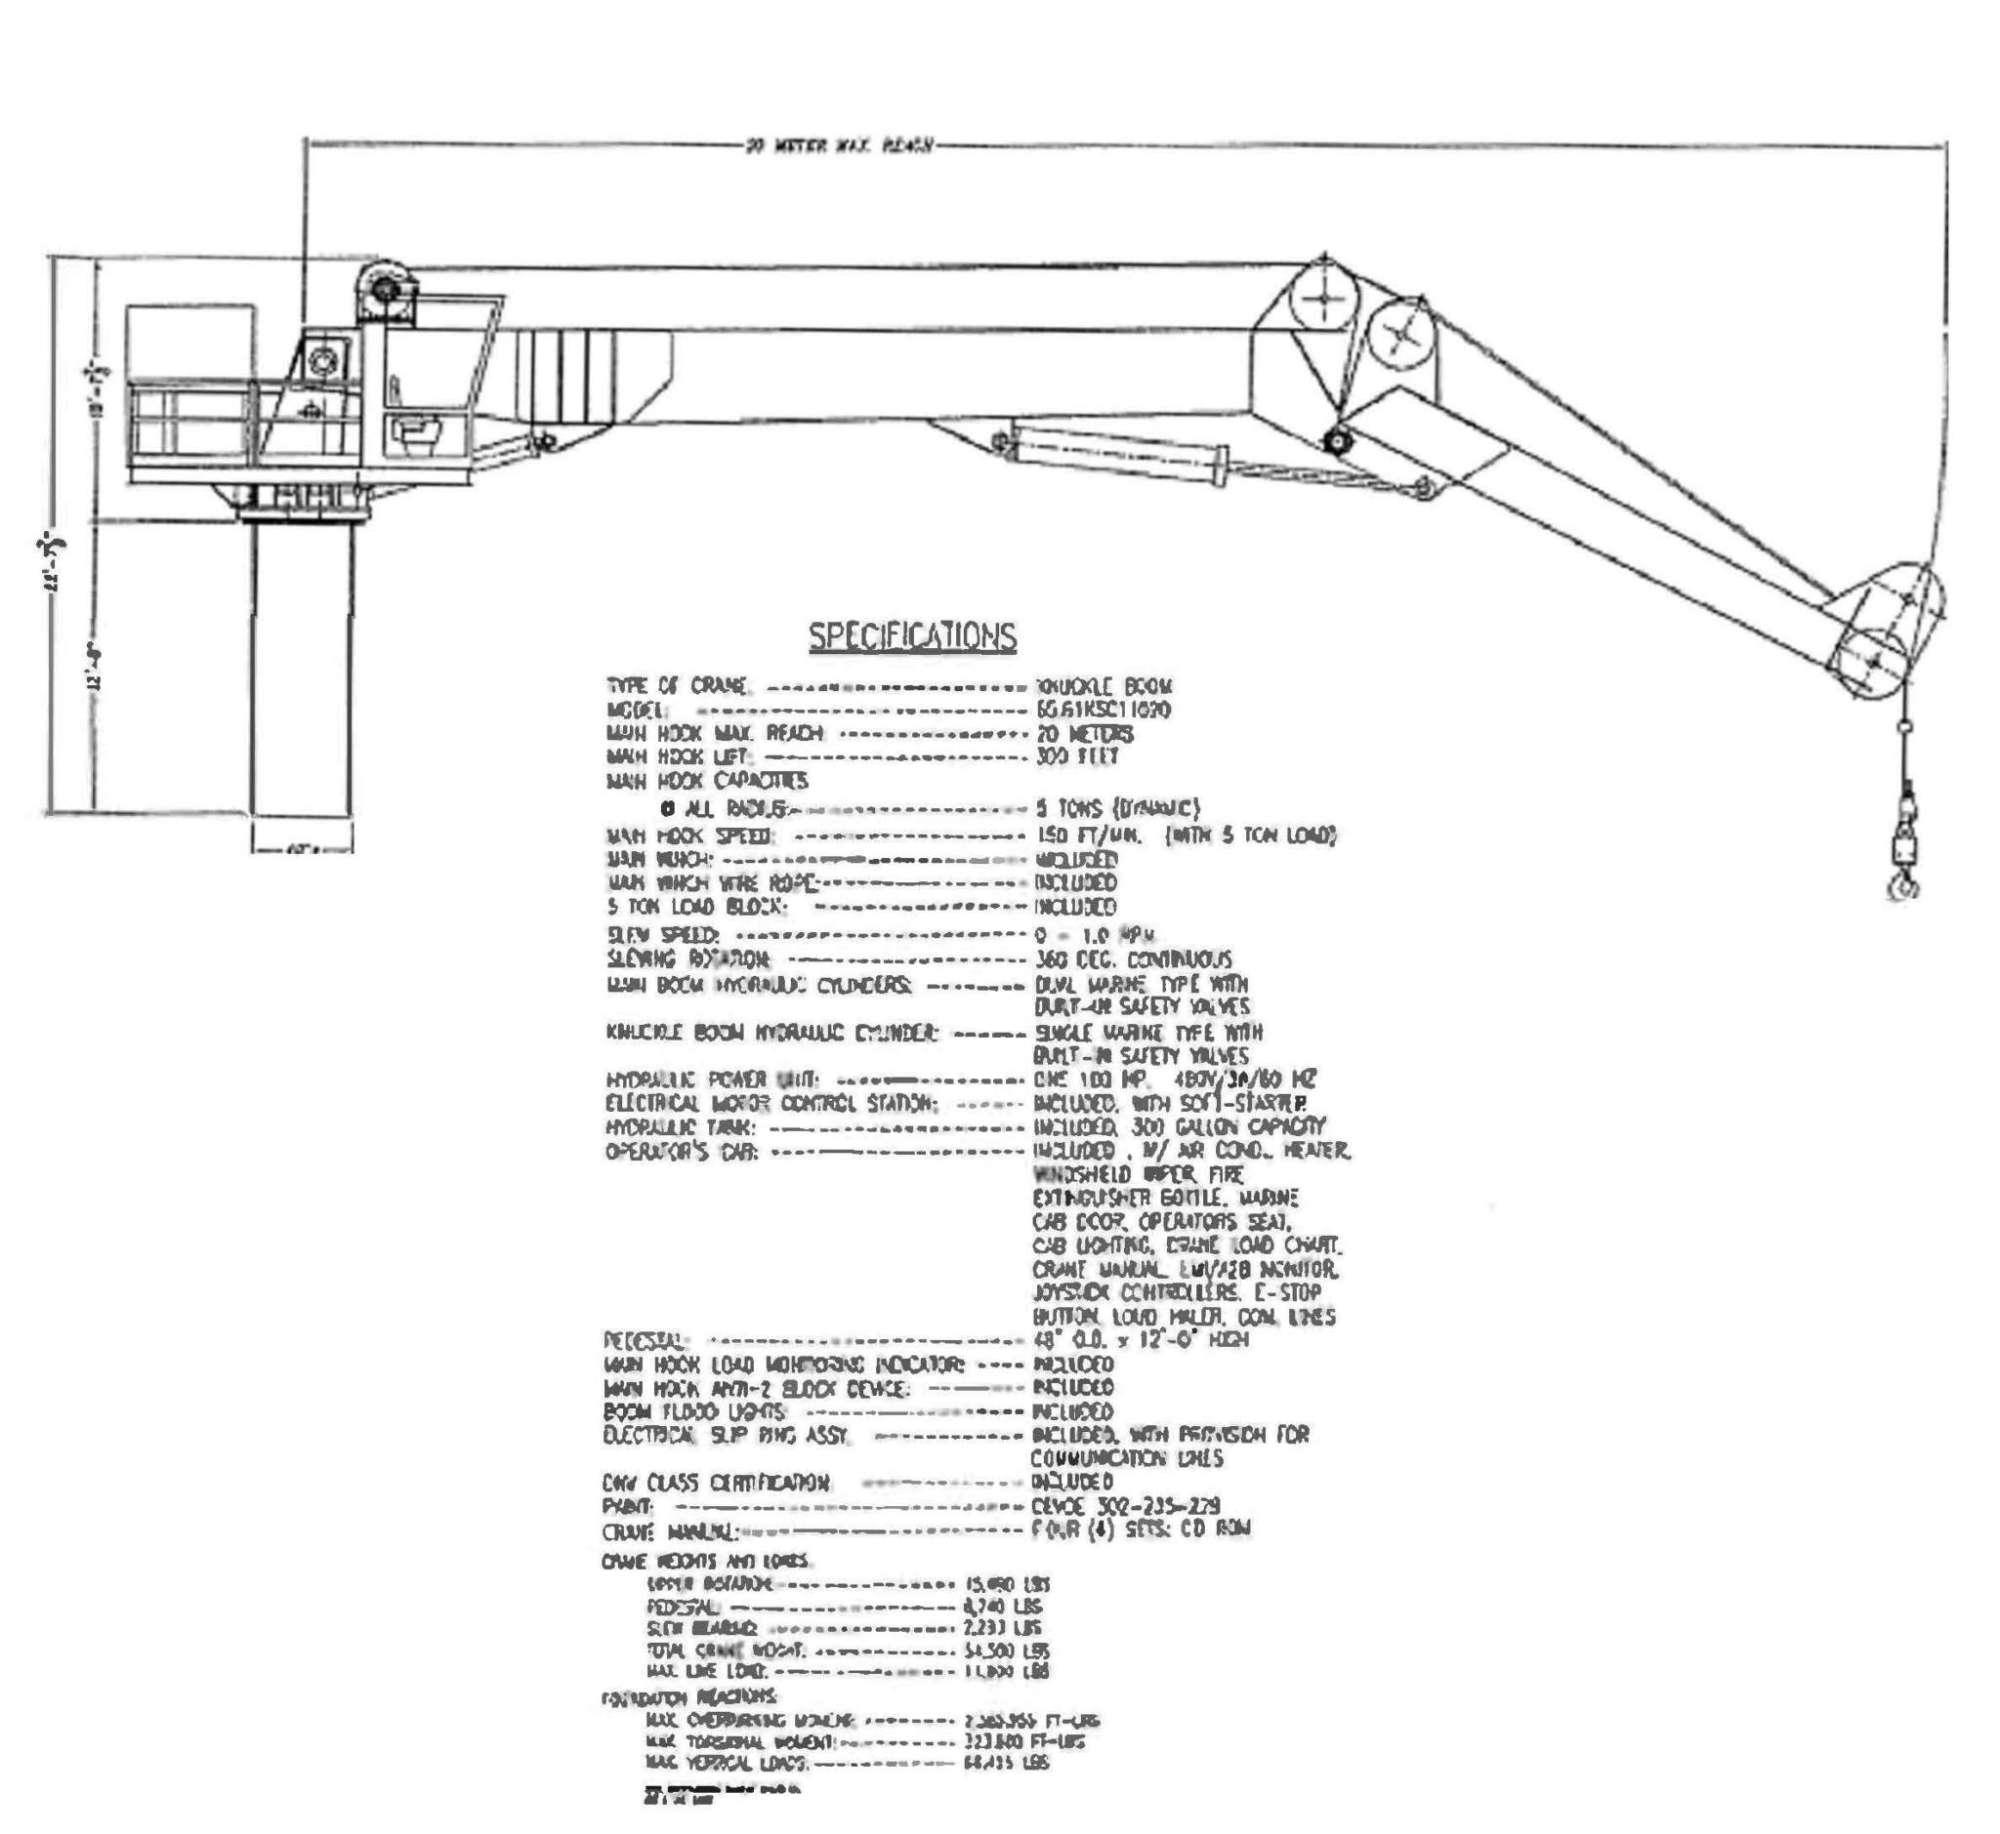 hight resolution of knuckle boom crane diagram wiring diagram expert knuckle boom crane diagram